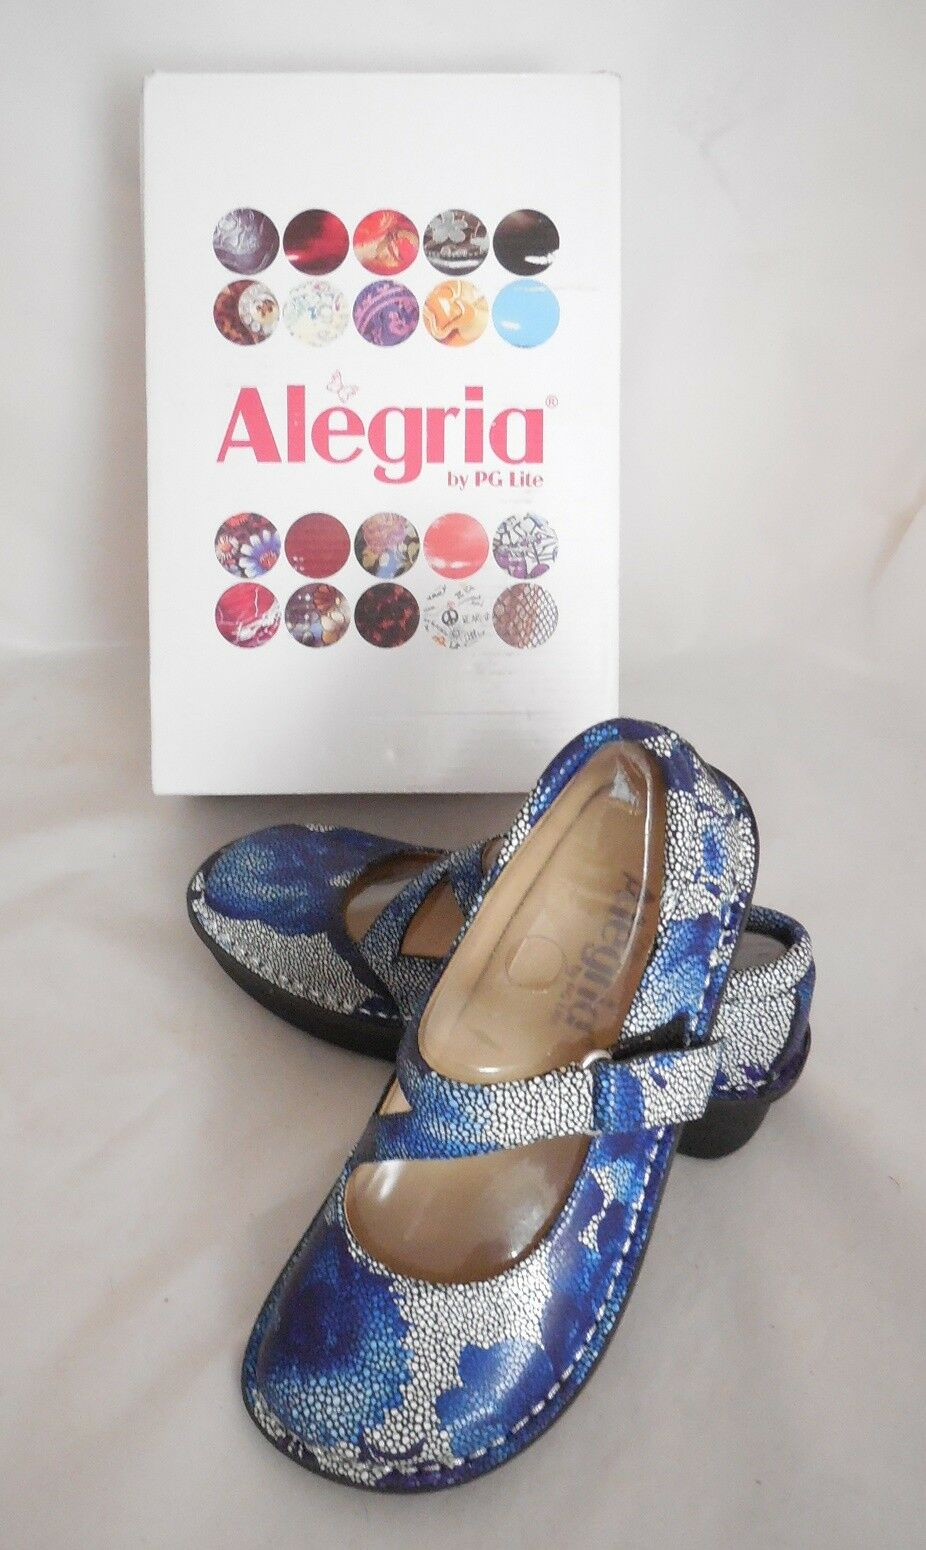 Alegria Women's Dayna DAY-367 Flats bluee Bouquet Bouquet Bouquet Mary Jane Clog Sz 35 (US 5-5.5) 456d43